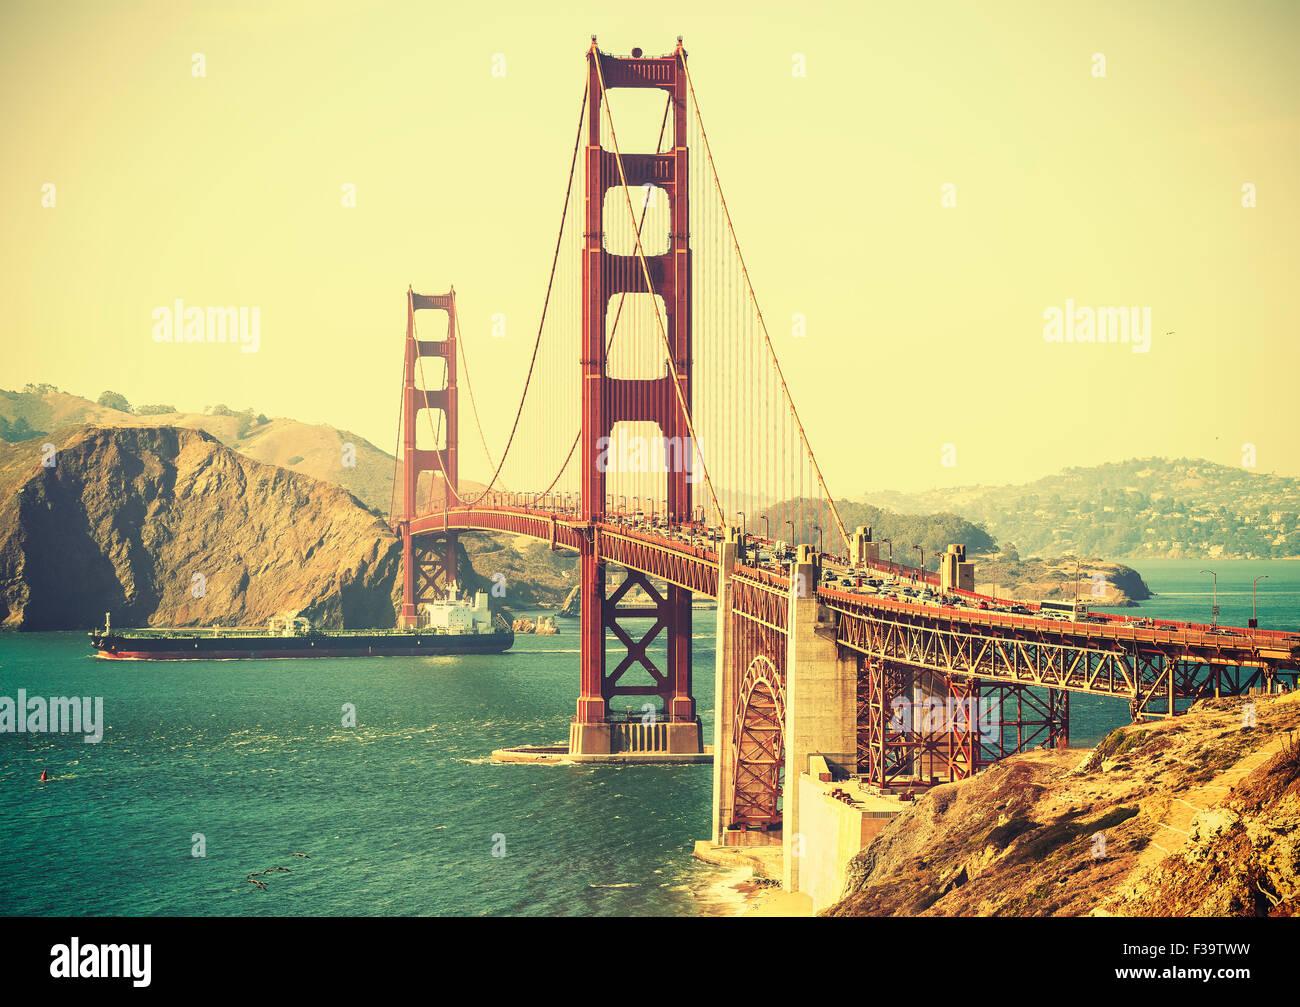 Vieux film retro style Golden Gate Bridge à San Francisco, USA. Photo Stock